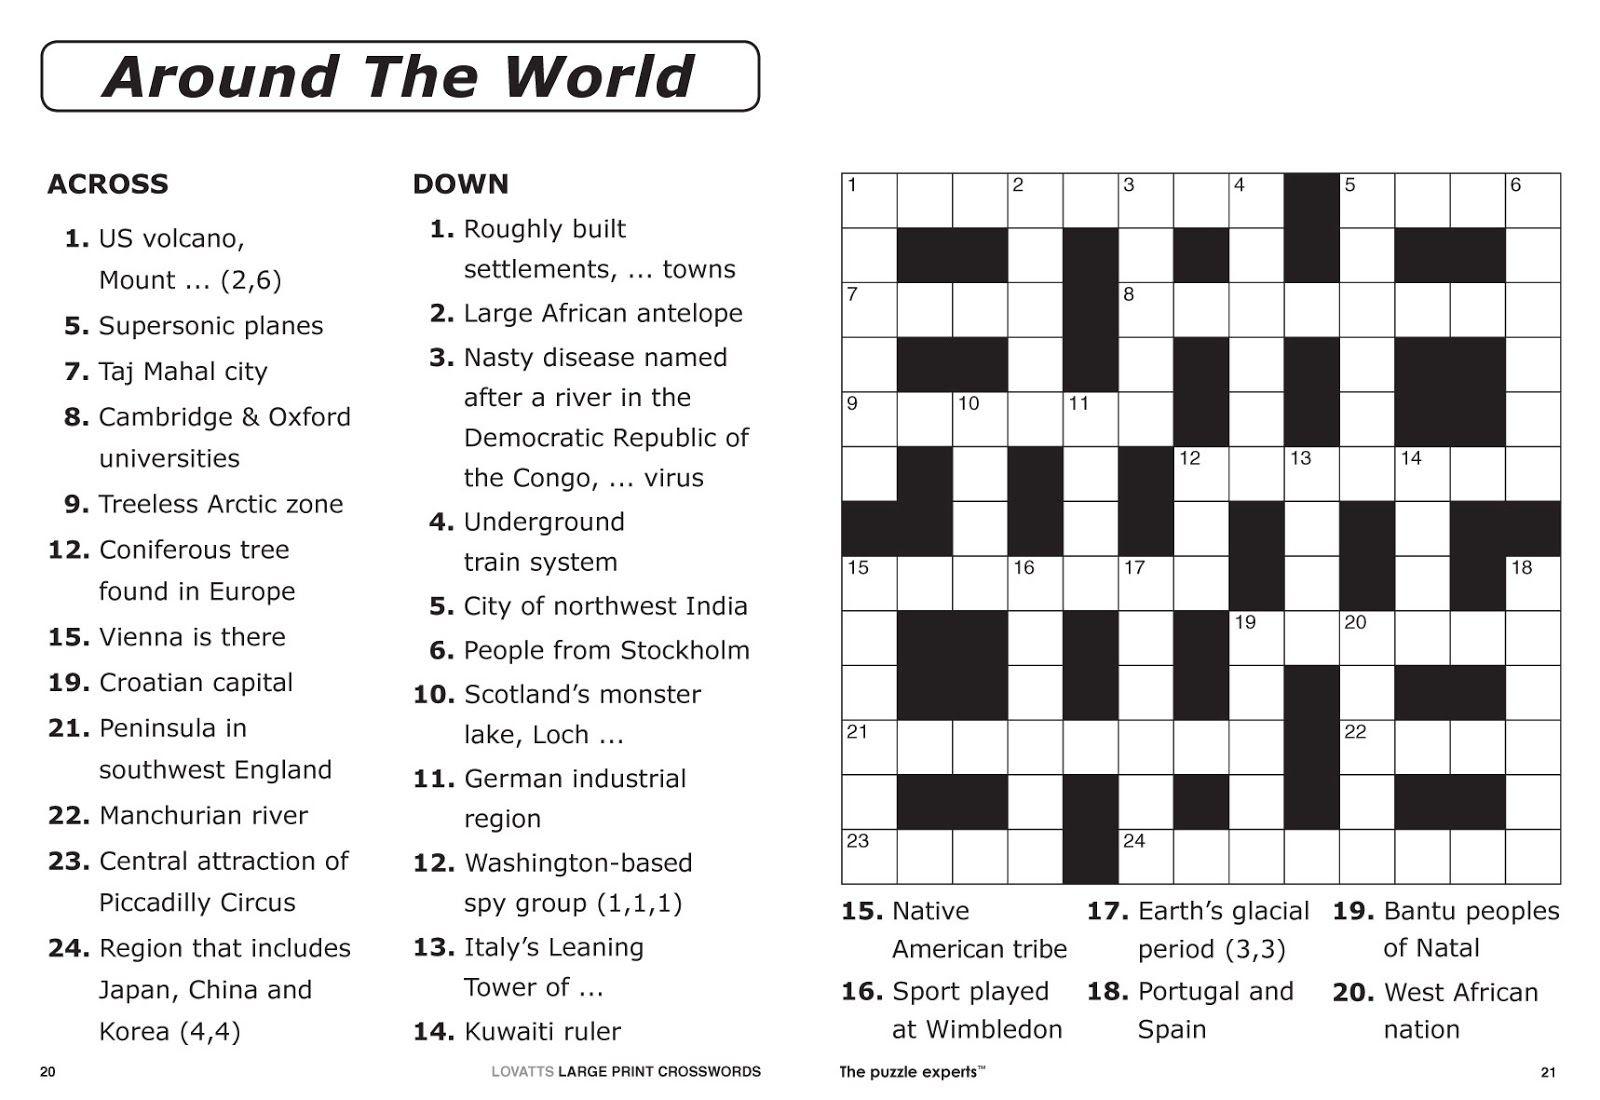 Easy Printable Crossword Puzzles | Elder Care & Dementia Care - Free - Crossword Puzzle Maker That Is Printable